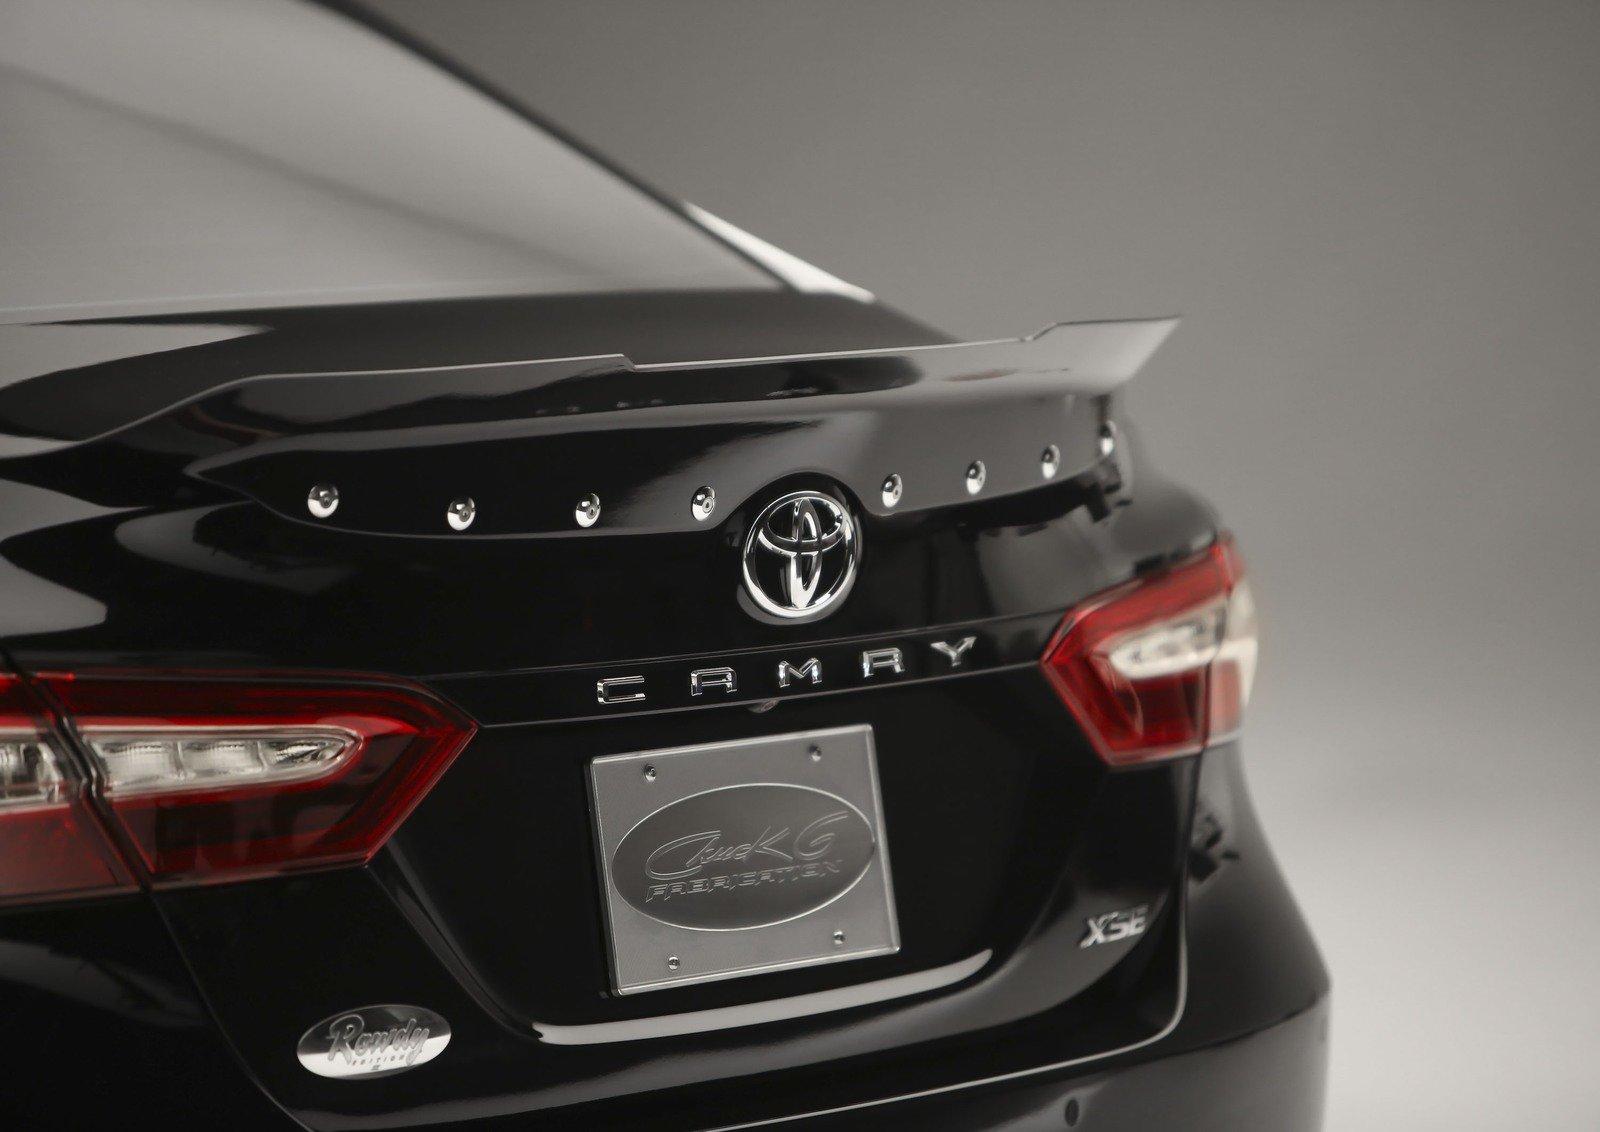 Toyota Camry 2018 Nascar